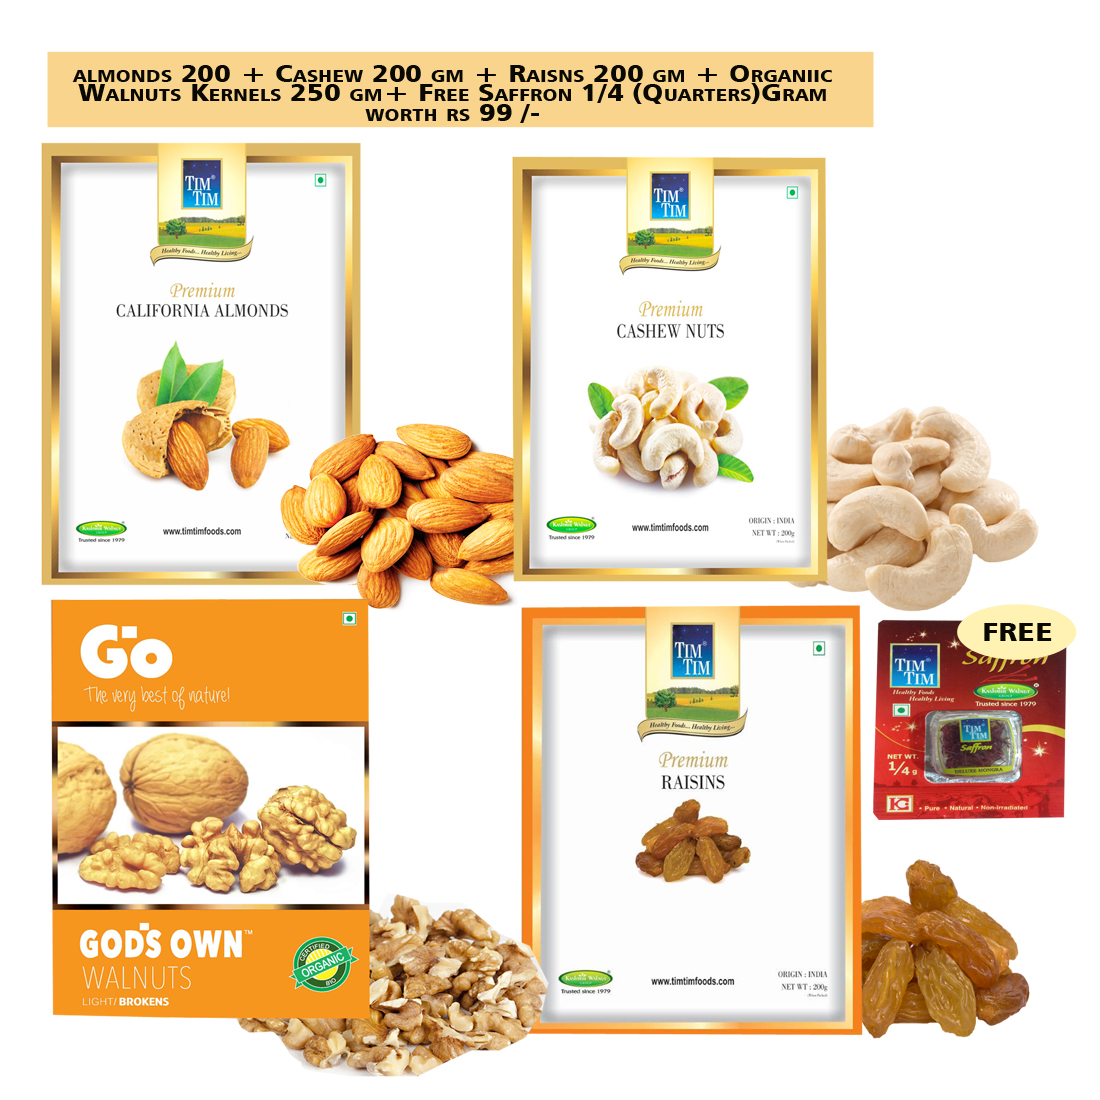 Premium Almonds 200gm & Premium Cashew Nuts 200 Gm & Walnuts Kernels(Go LB) 250gm & Premium Raisins 200gm + Free Saffron 1/4 Gms worths Rs 99/-